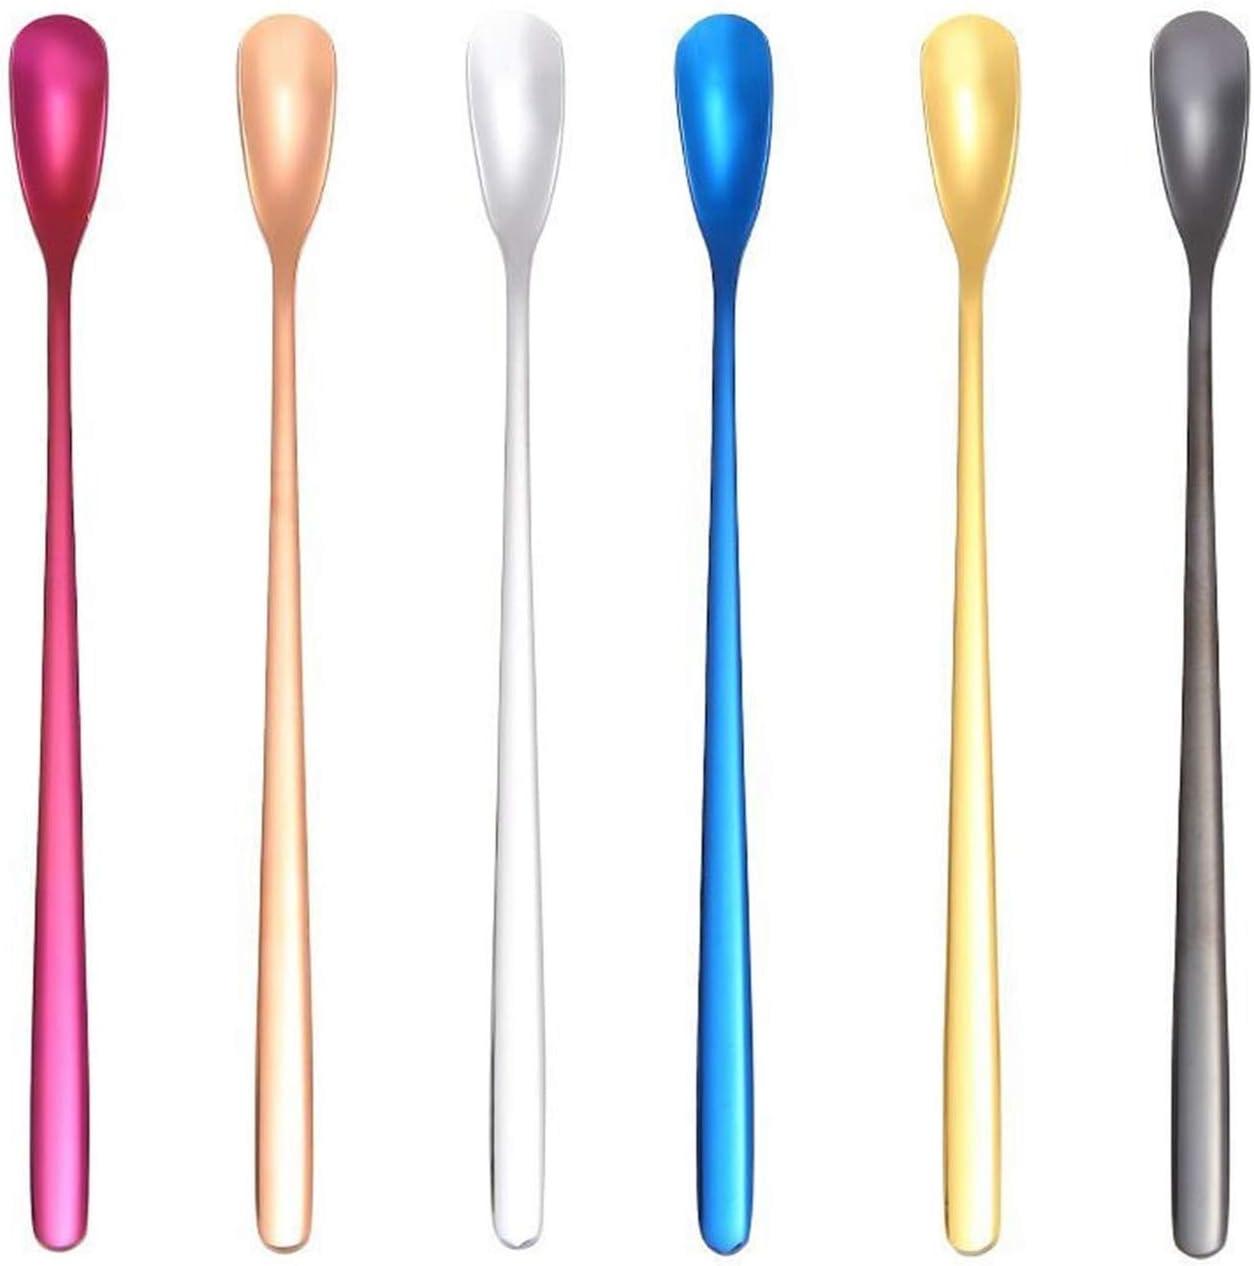 Dessert Japan Maker New Spoon Long Handle Stirring Stainless Arlington Mall Steel Tea Ice